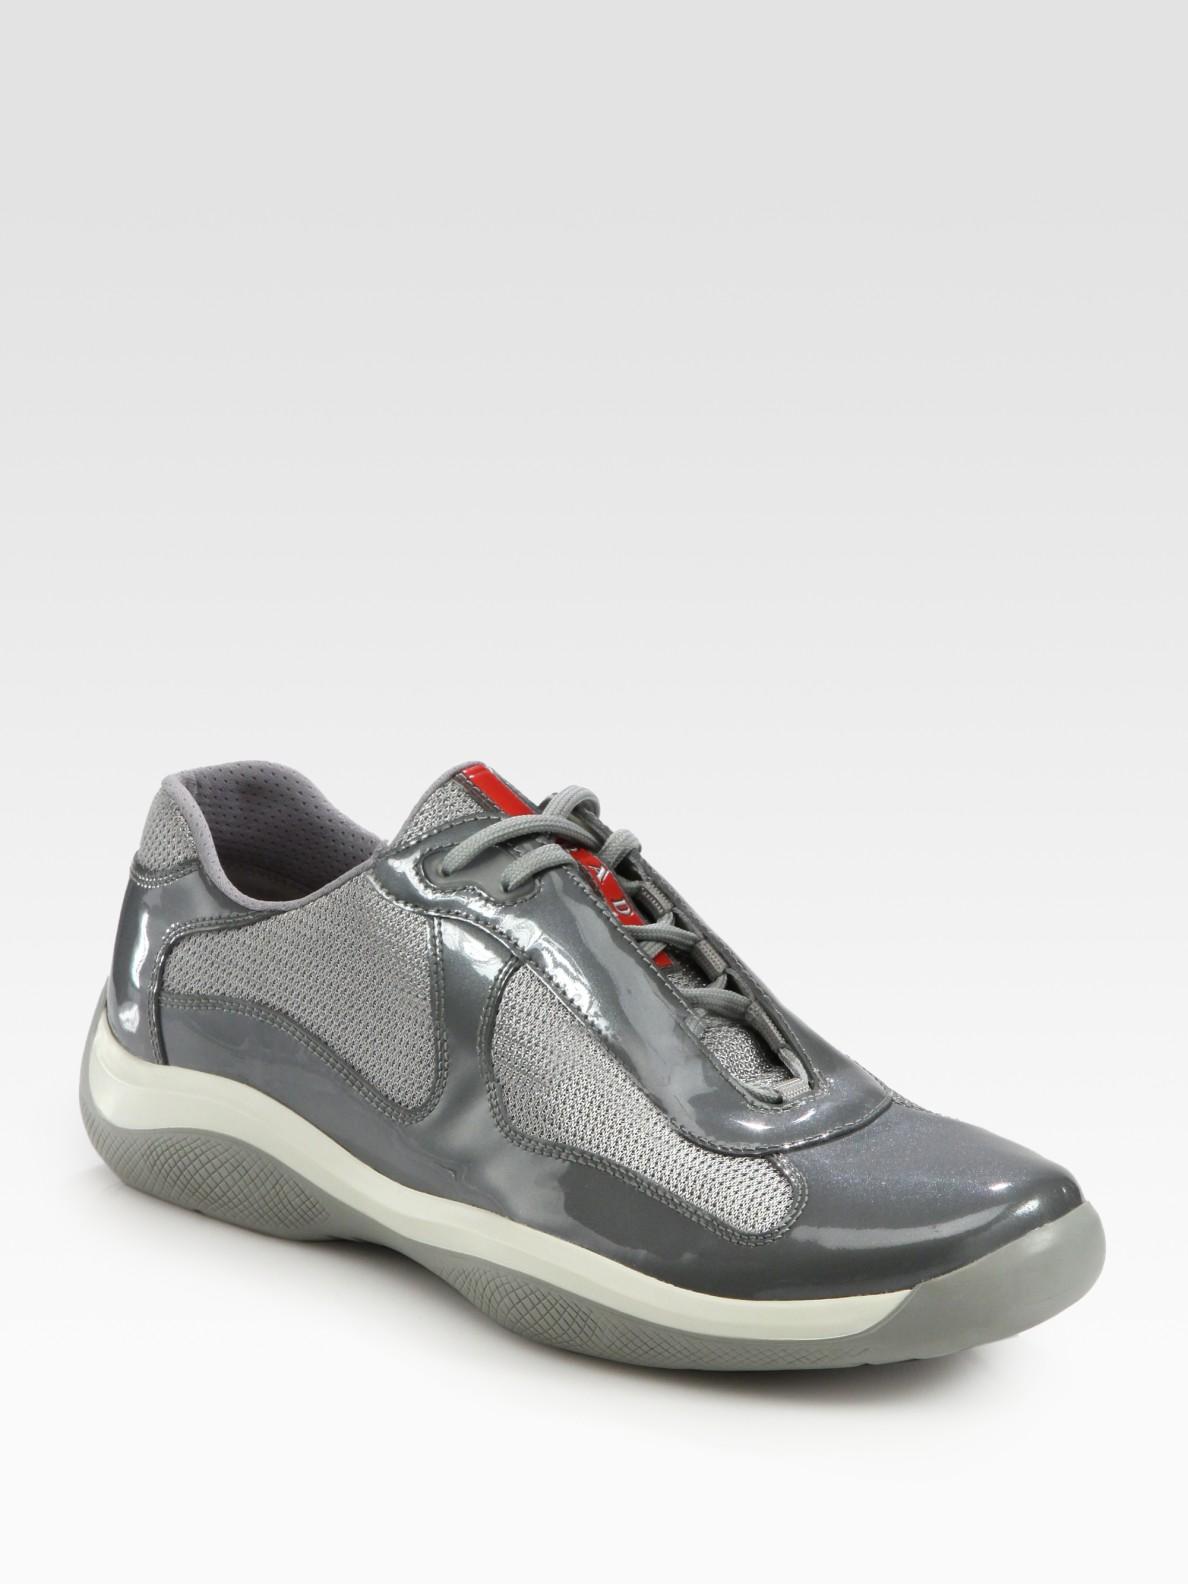 Prada Americas Cup Leather Sneakers in